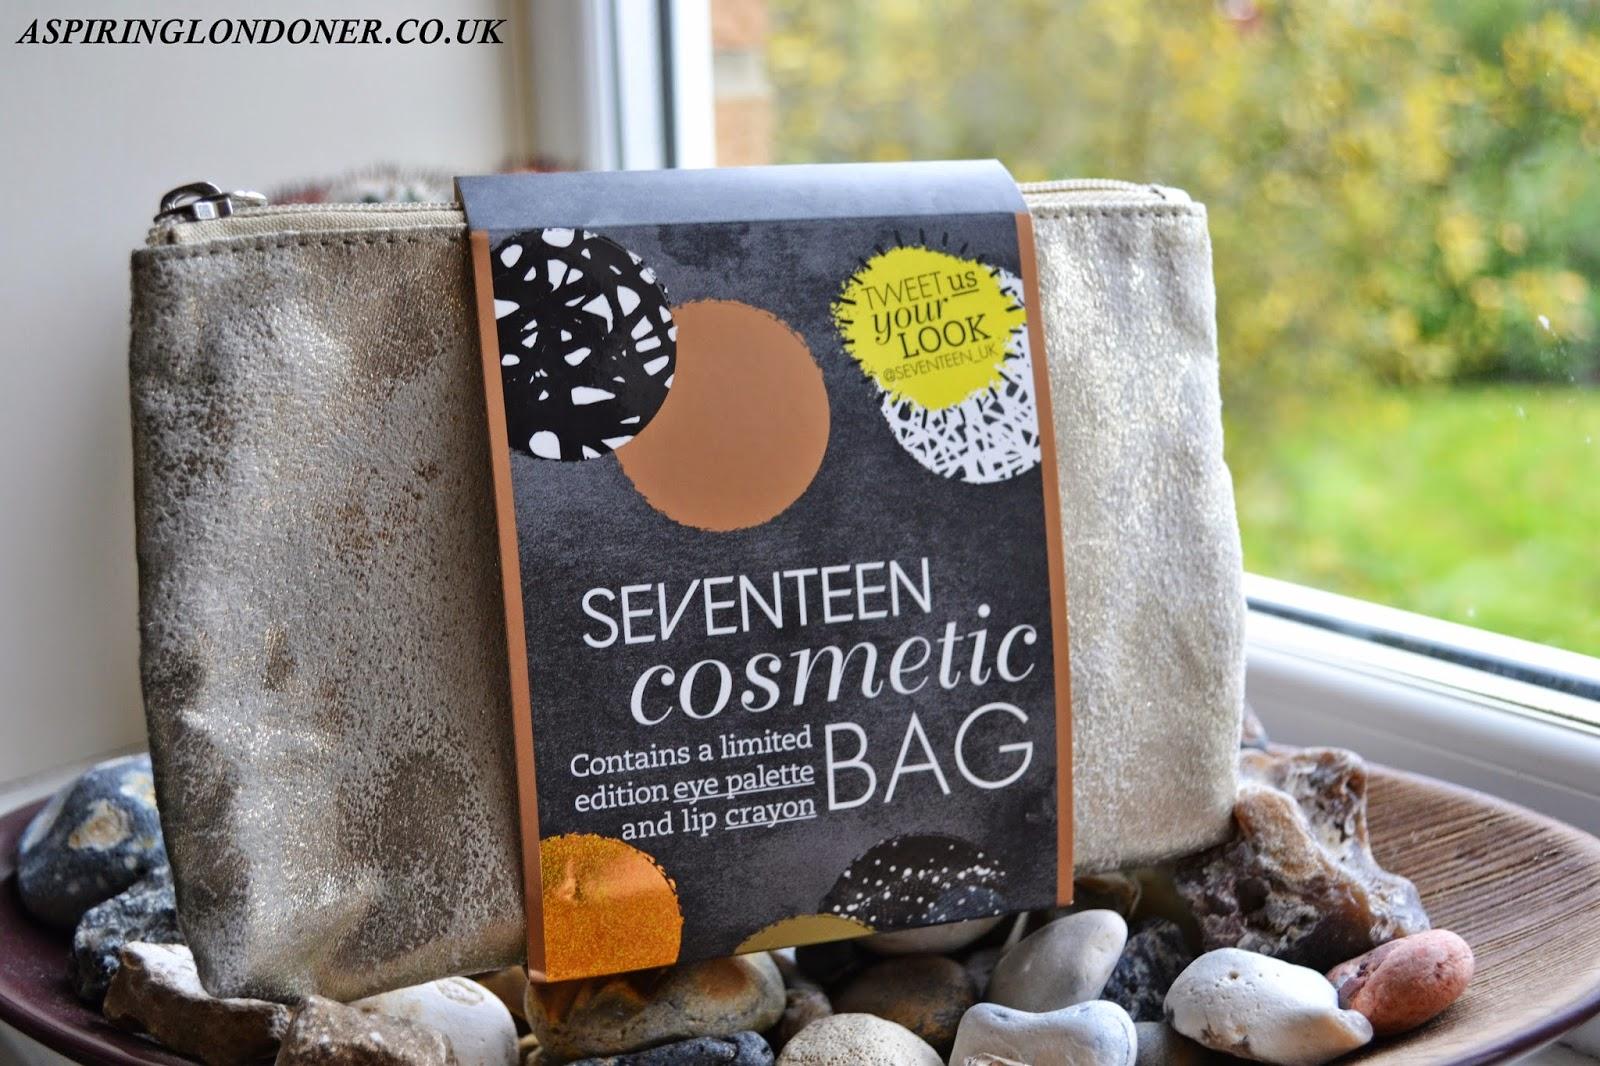 Seventeen Eye Palette and Lip Crayon Cosmetic Bag Review - Aspiring Londoner